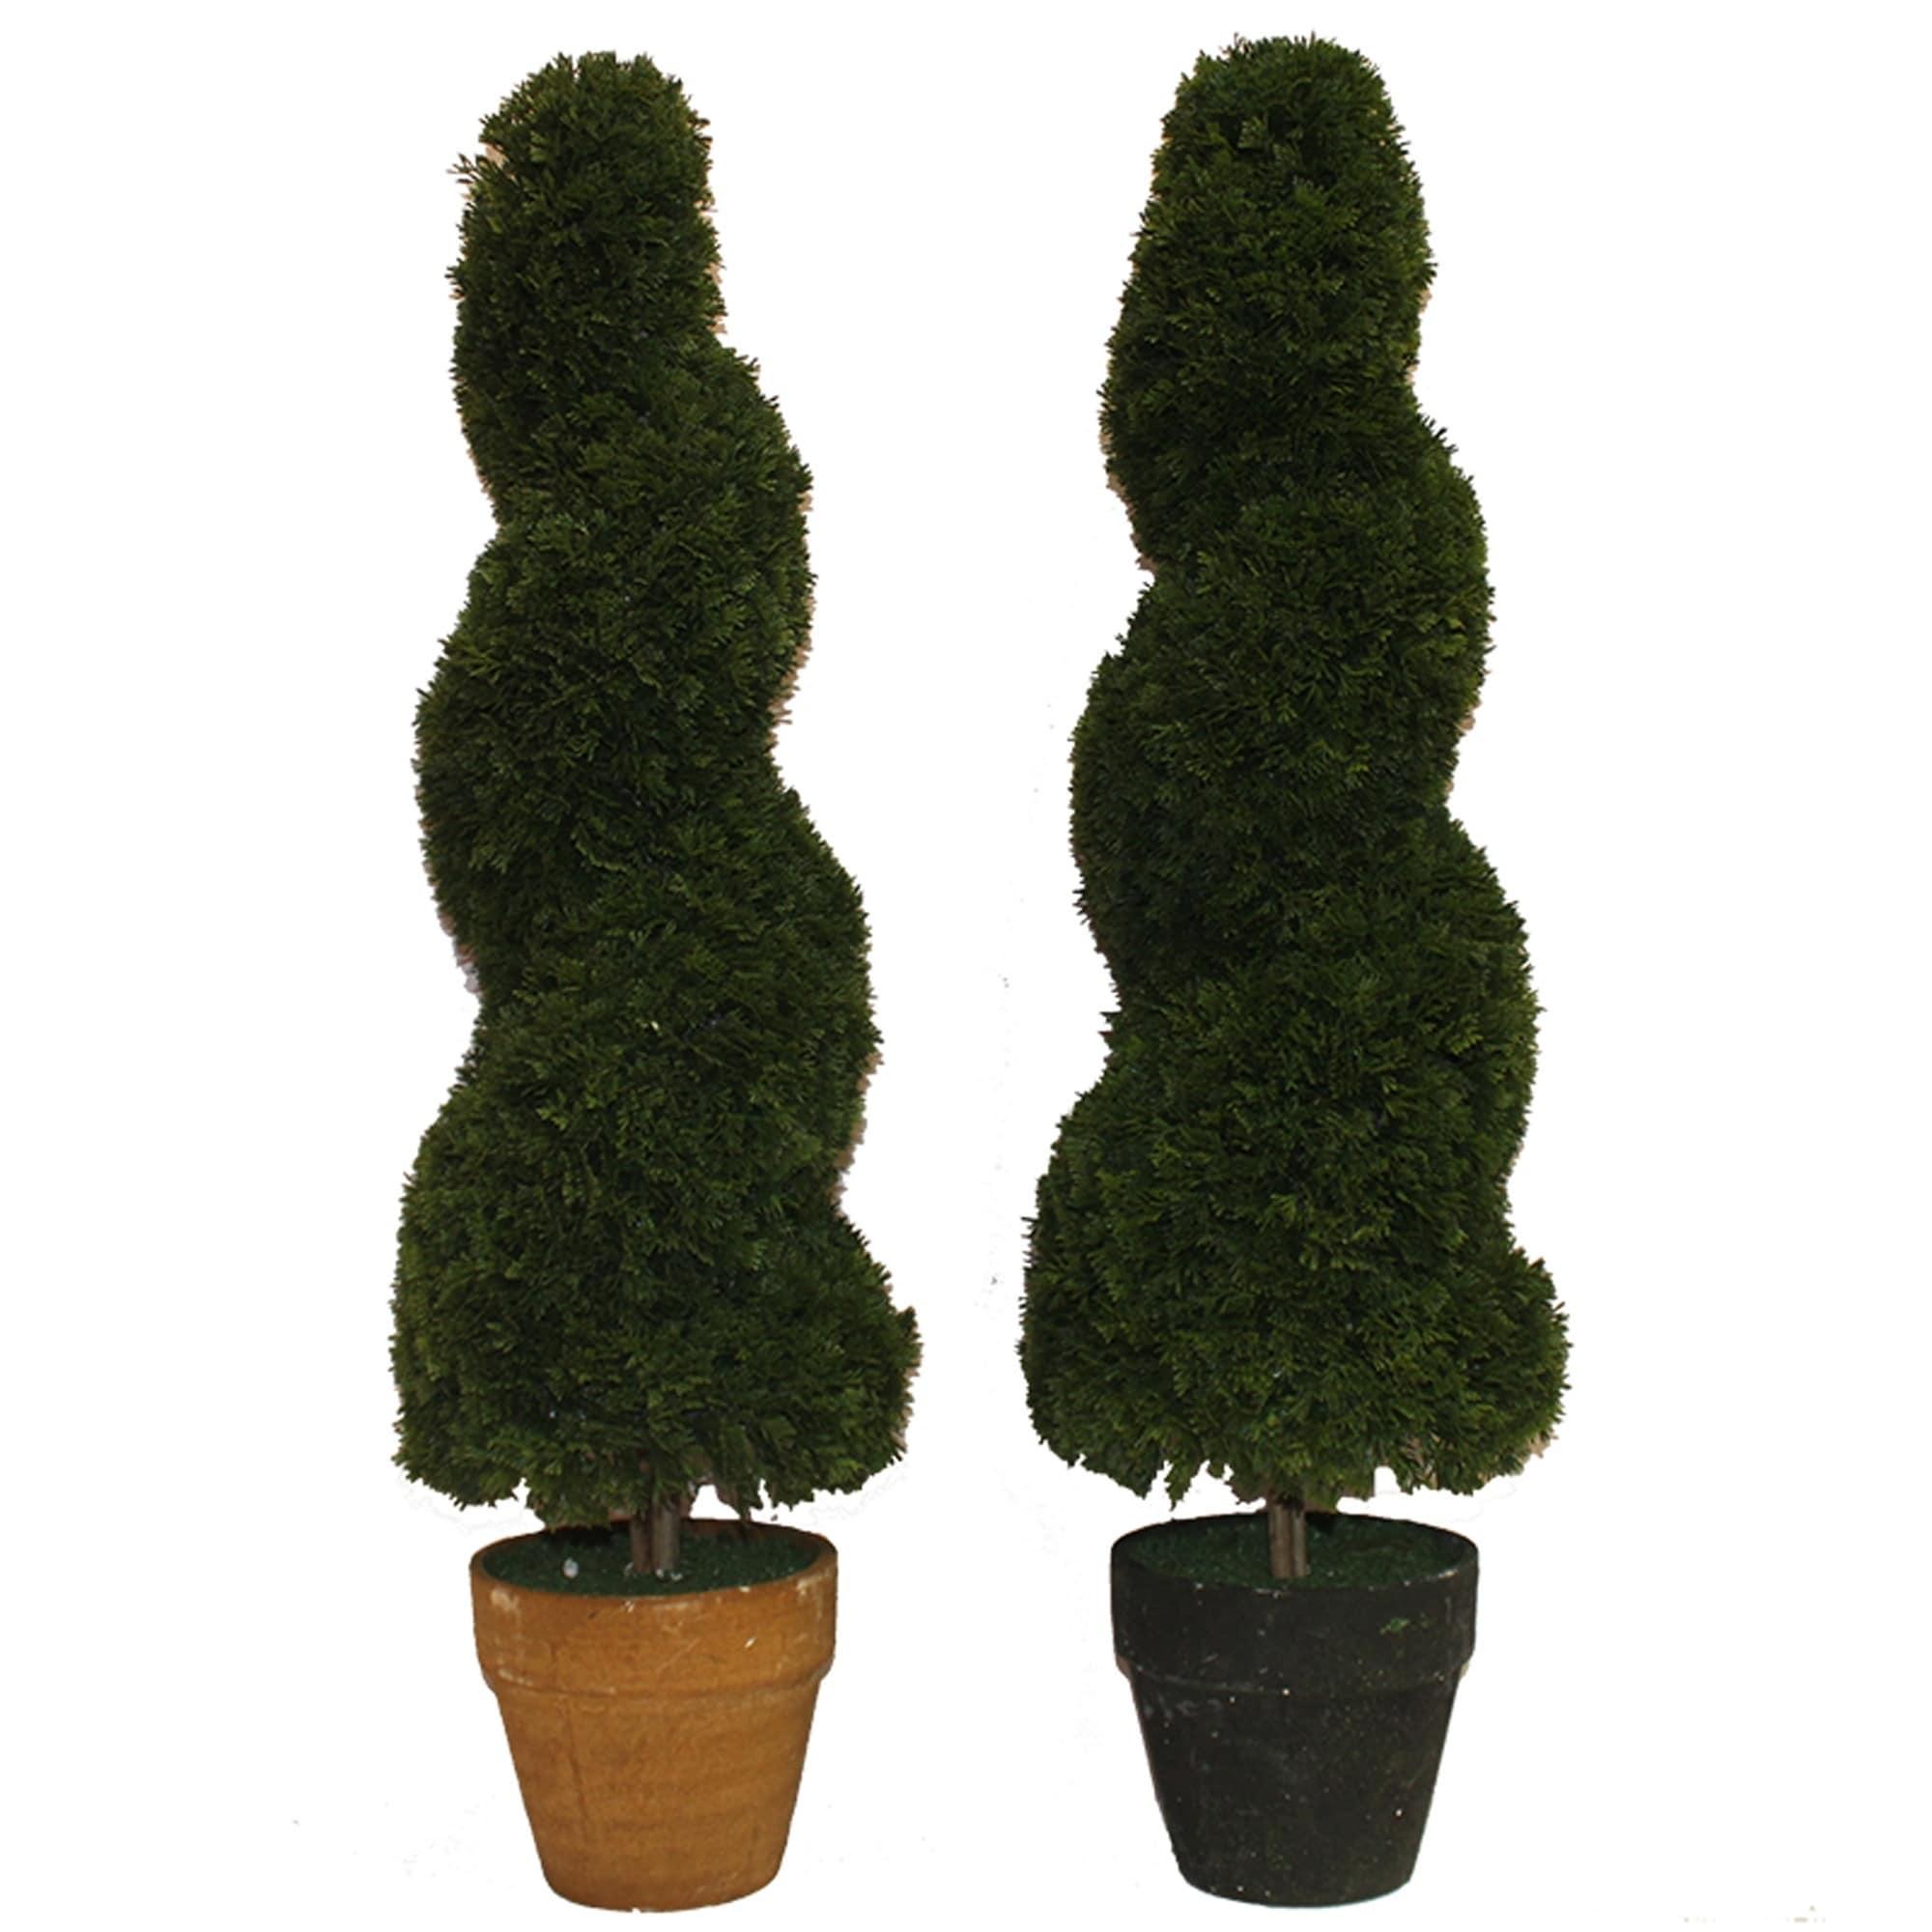 Essential Decor Beyond 2pc Spiral Floor Boxwood Topiary In Pot En112036 Green 30 X 9 X 9 Overstock 25558096